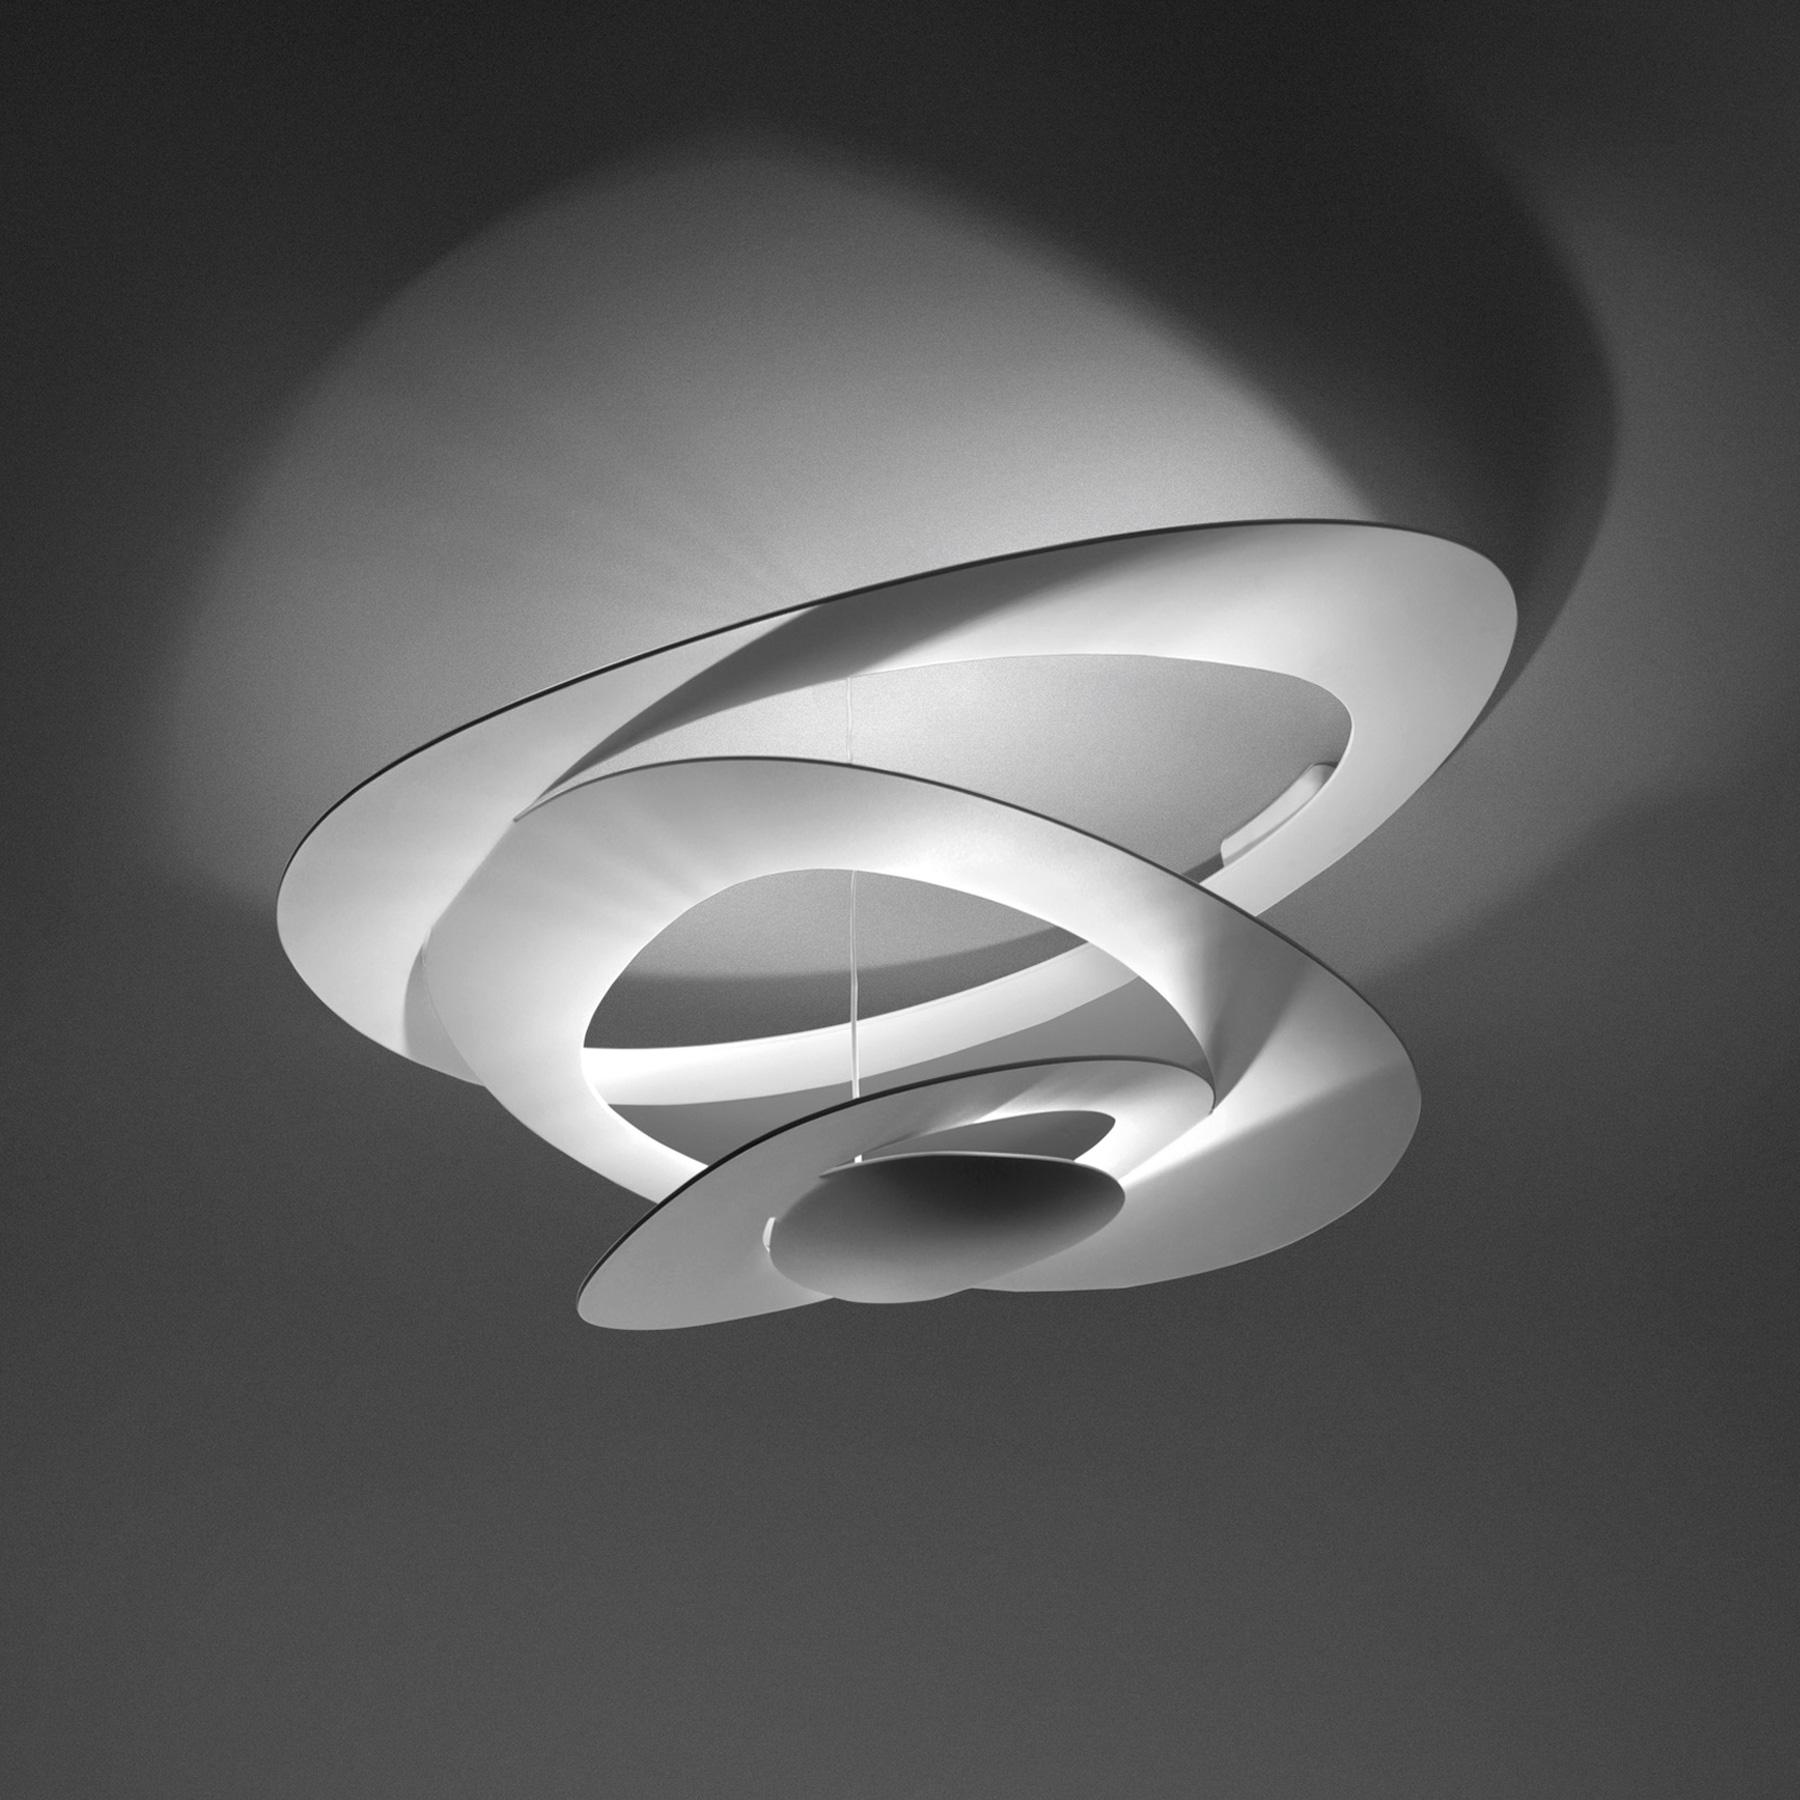 artemide pirce mini soffitto deckenleuchte 1247010a reuter onlineshop. Black Bedroom Furniture Sets. Home Design Ideas